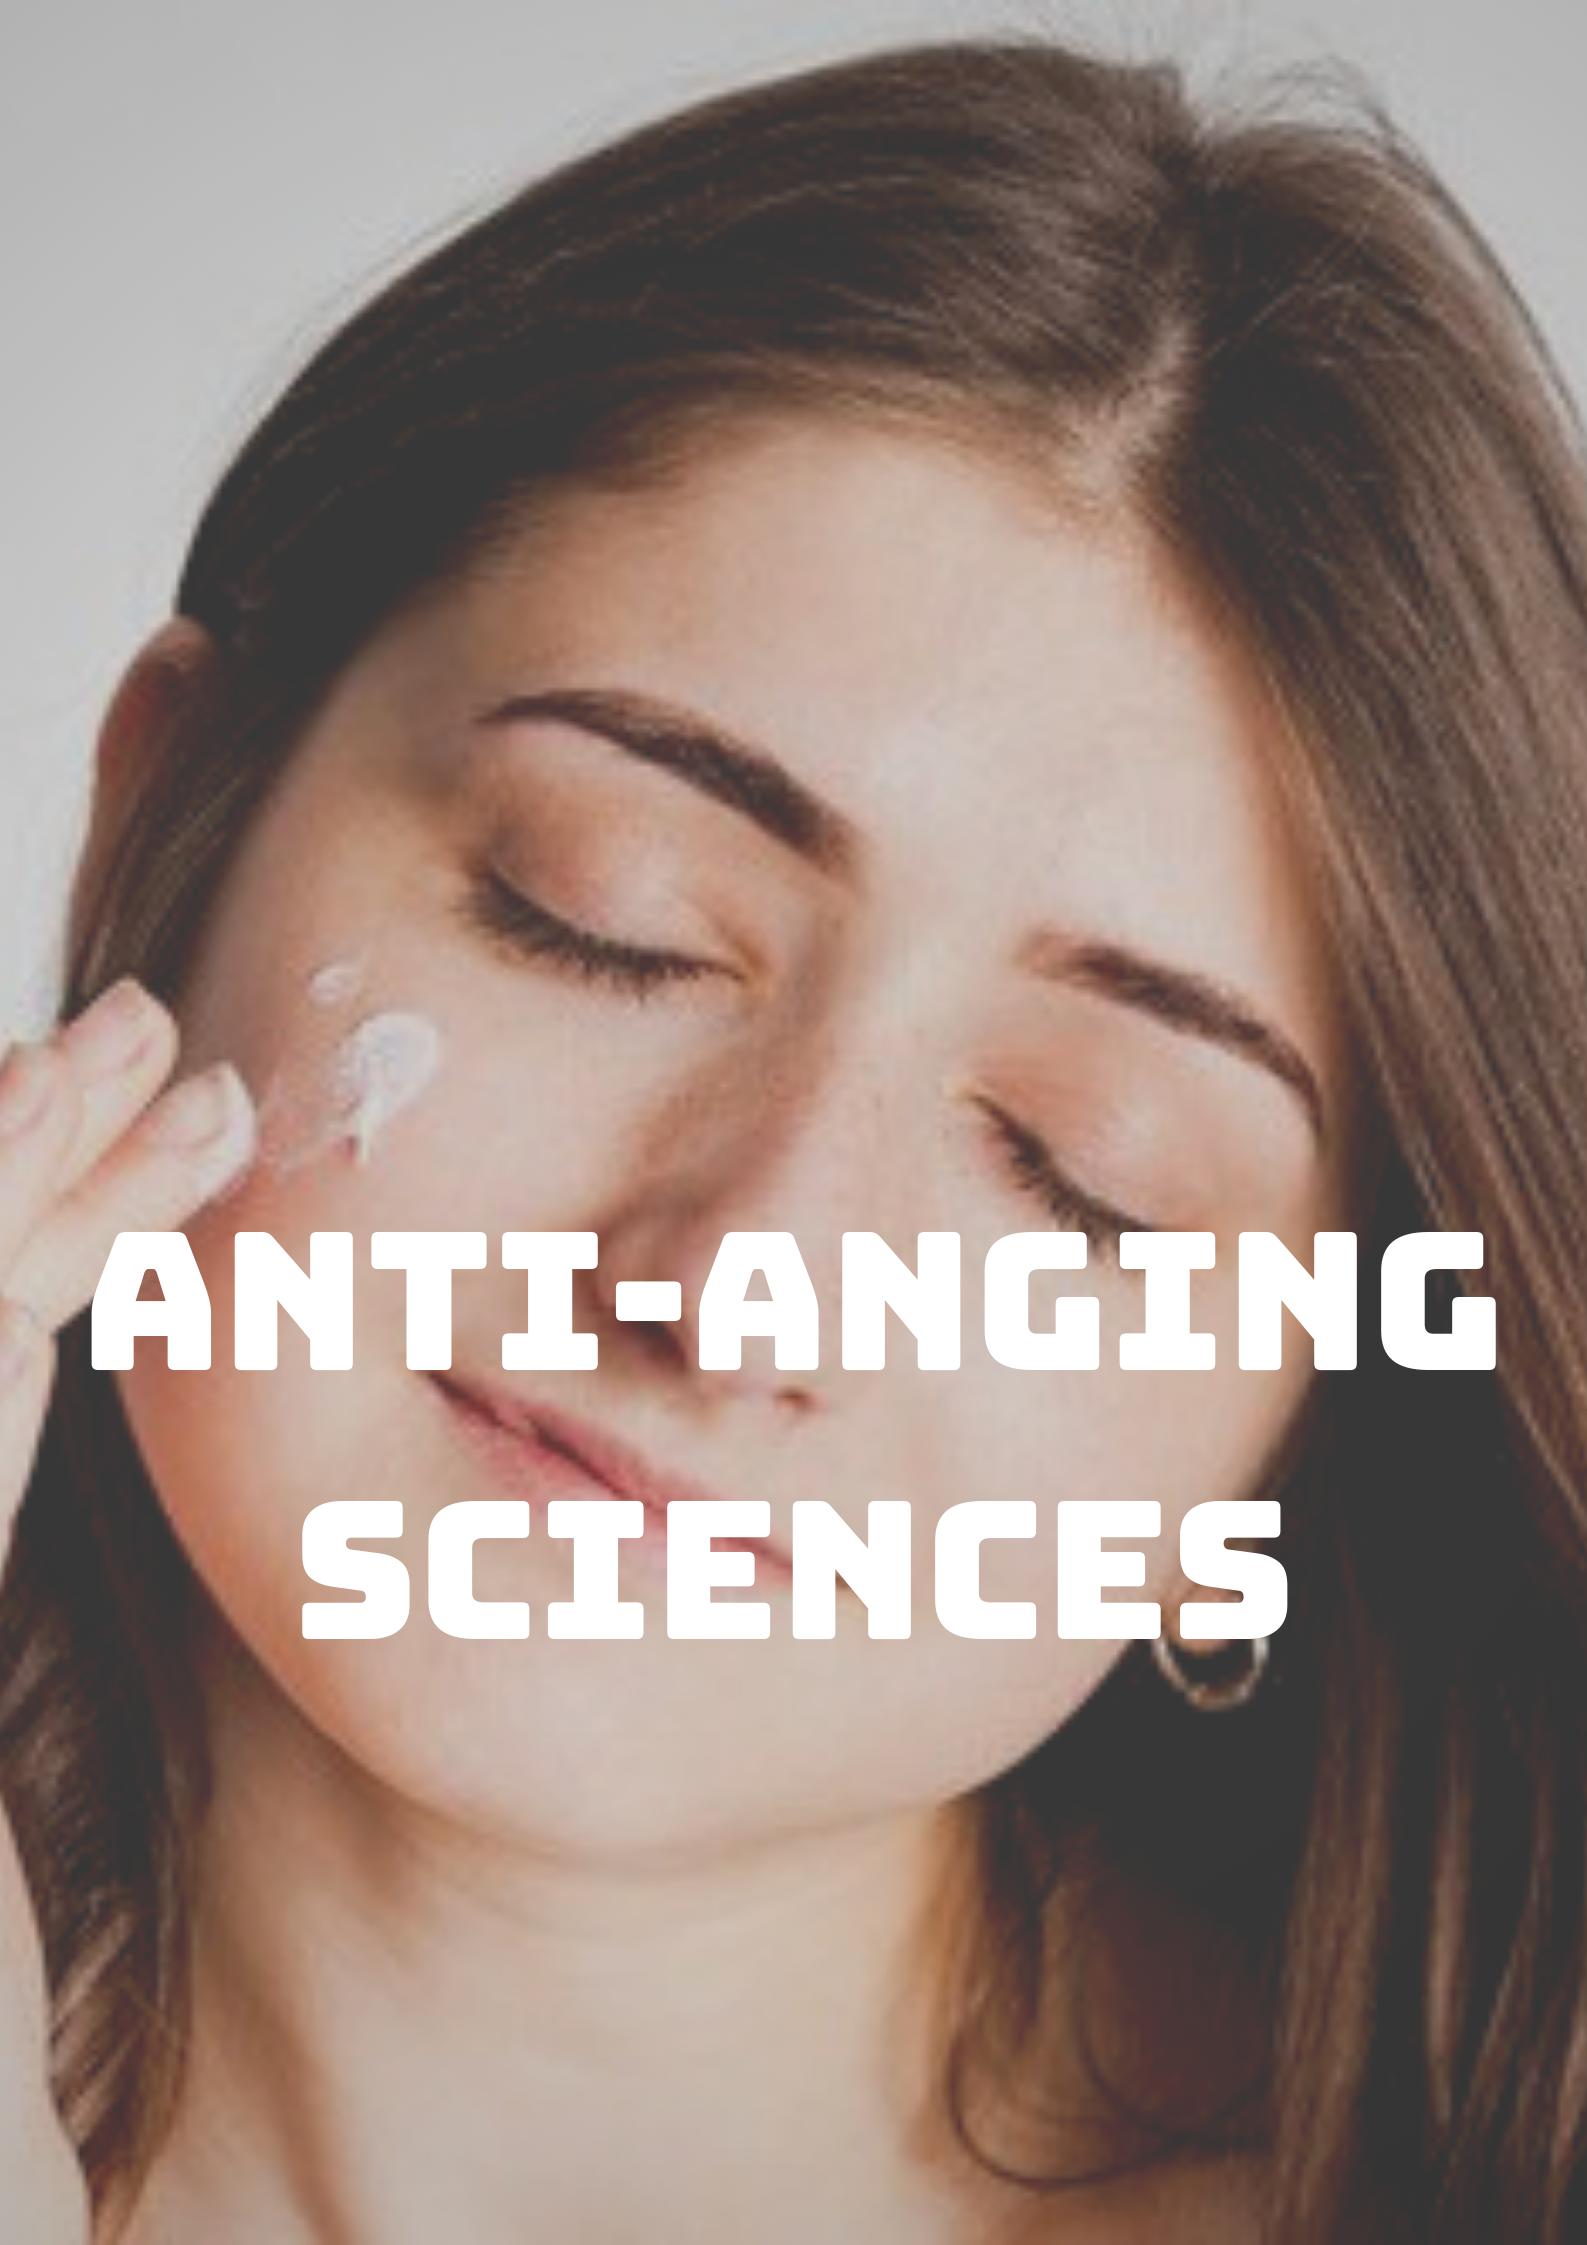 Anti-Anging Sciences Photo